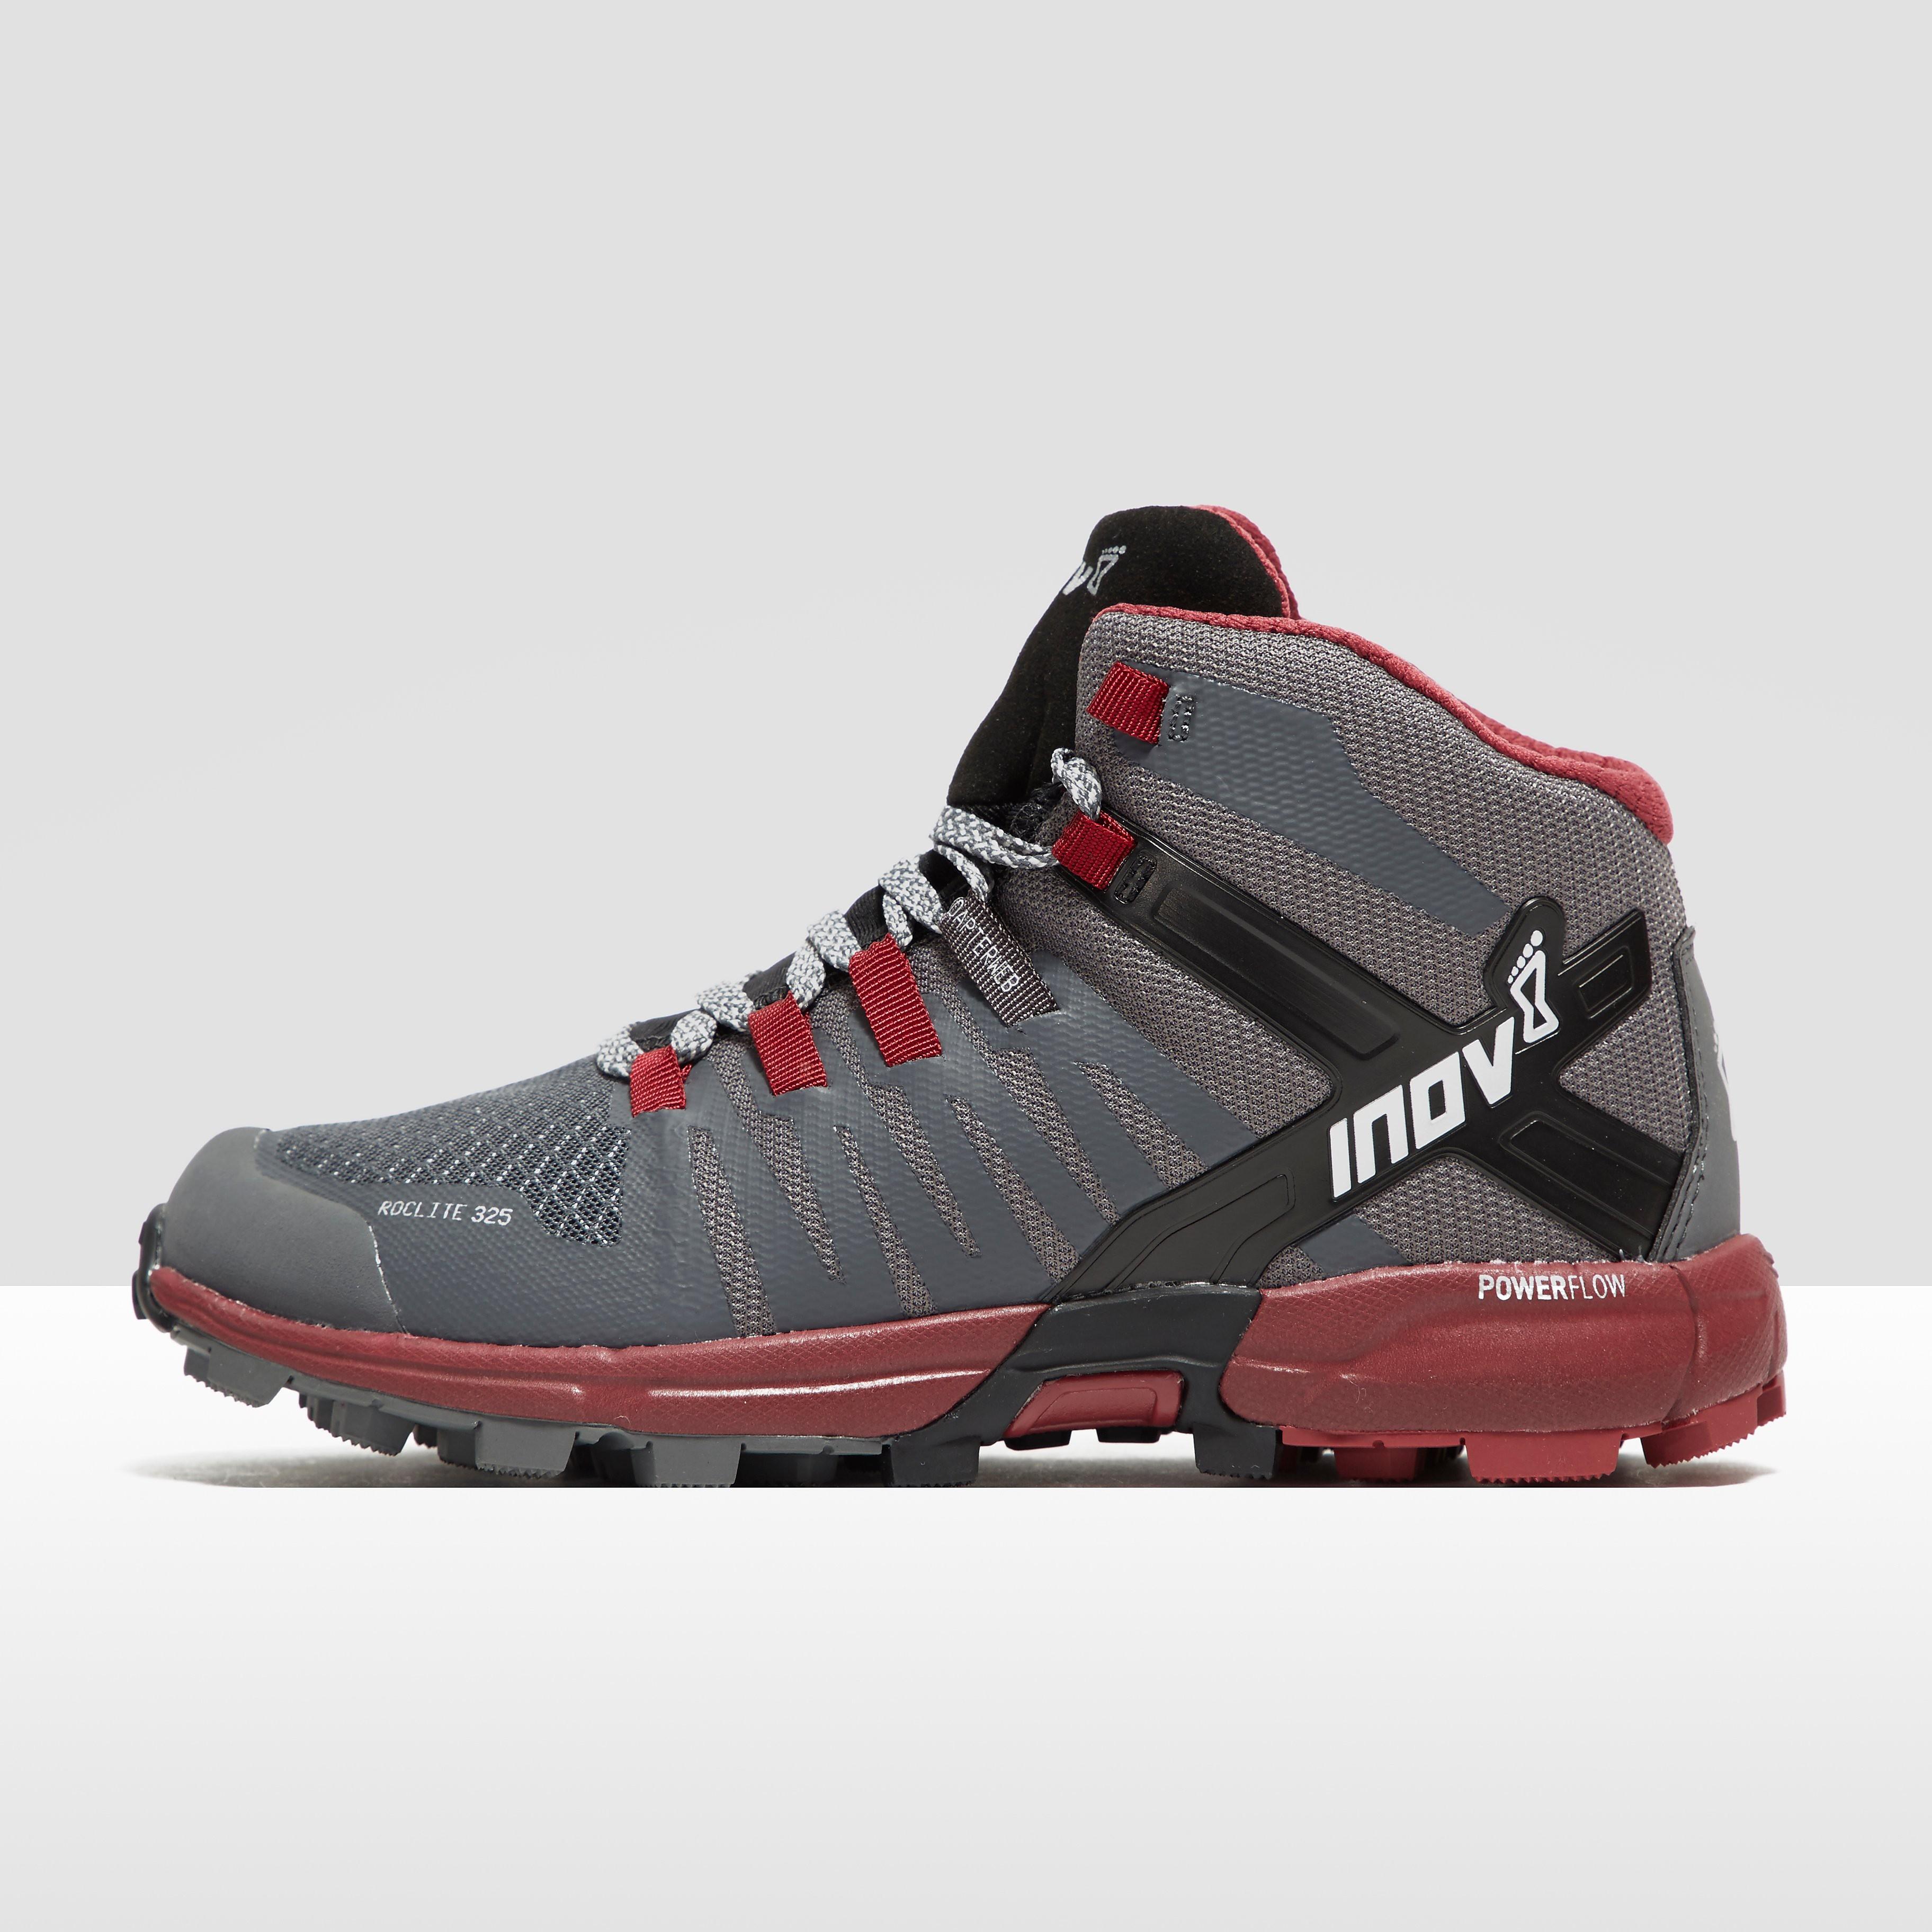 Inov-8 Roclite 325 Women's Trail Running Boots